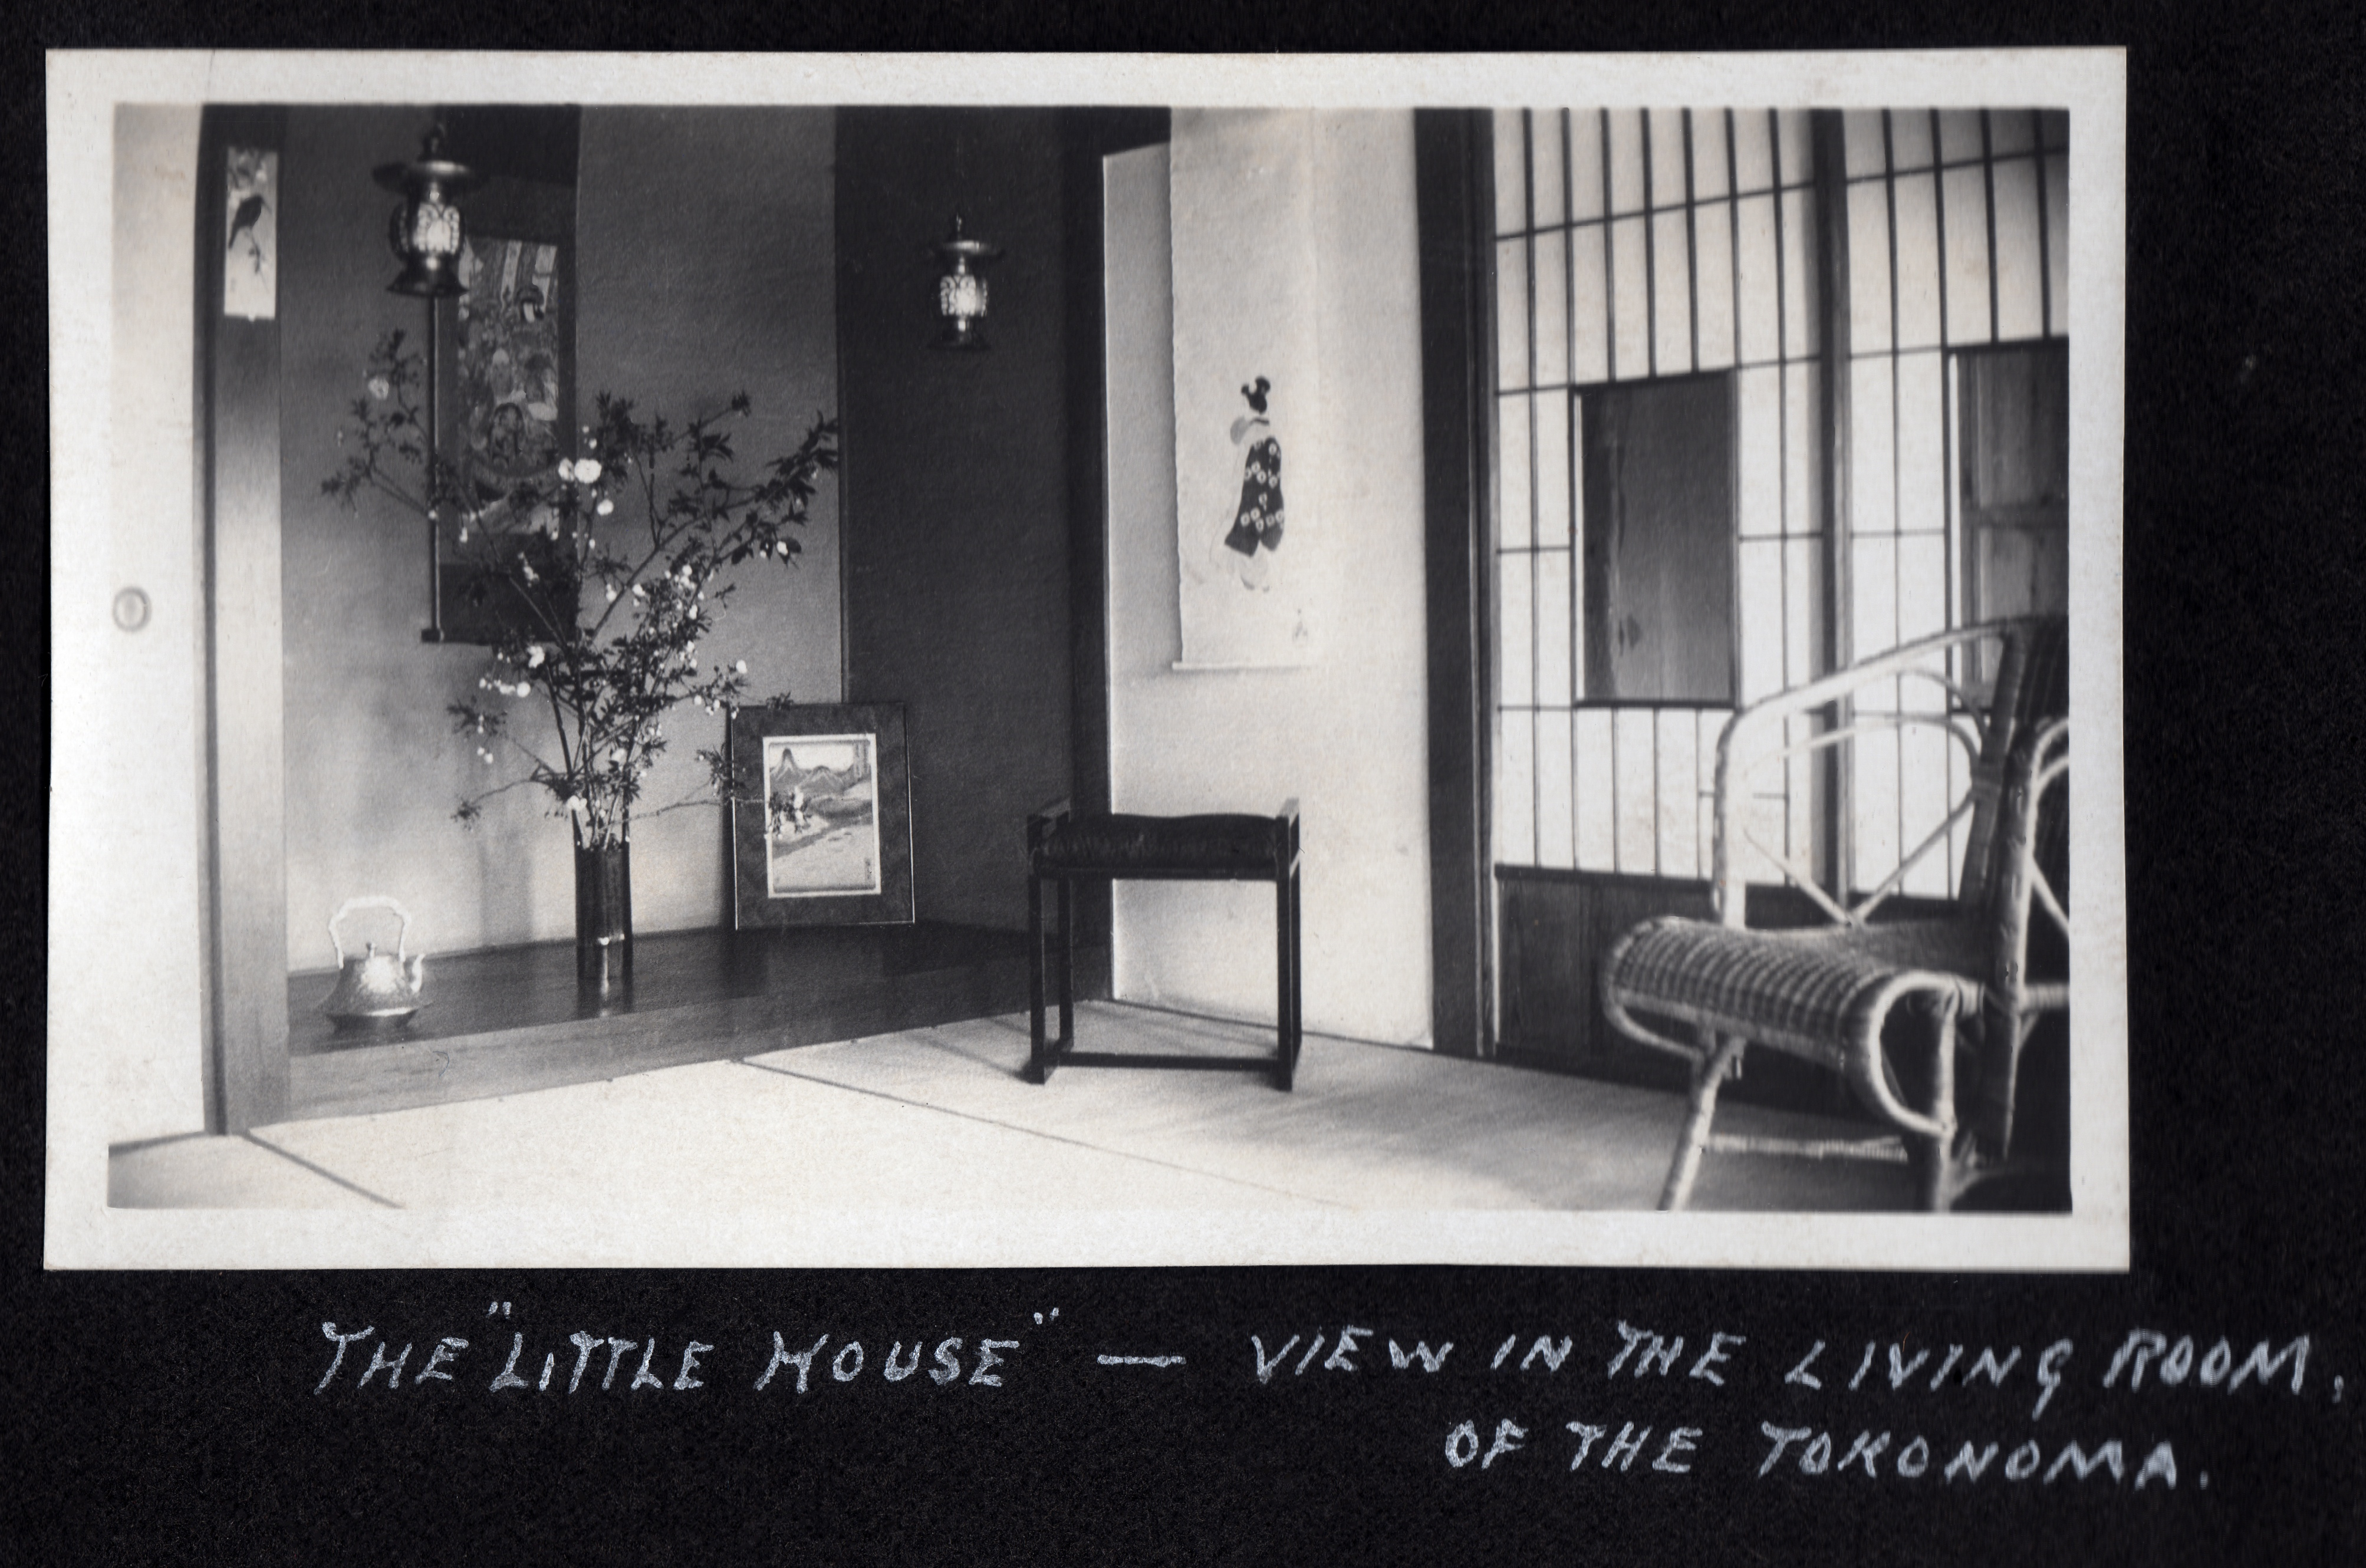 File:Tokonoma in the living room of Japanese little house (1914 by Elstner Hilton & File:Tokonoma in the living room of Japanese little house (1914 by ...